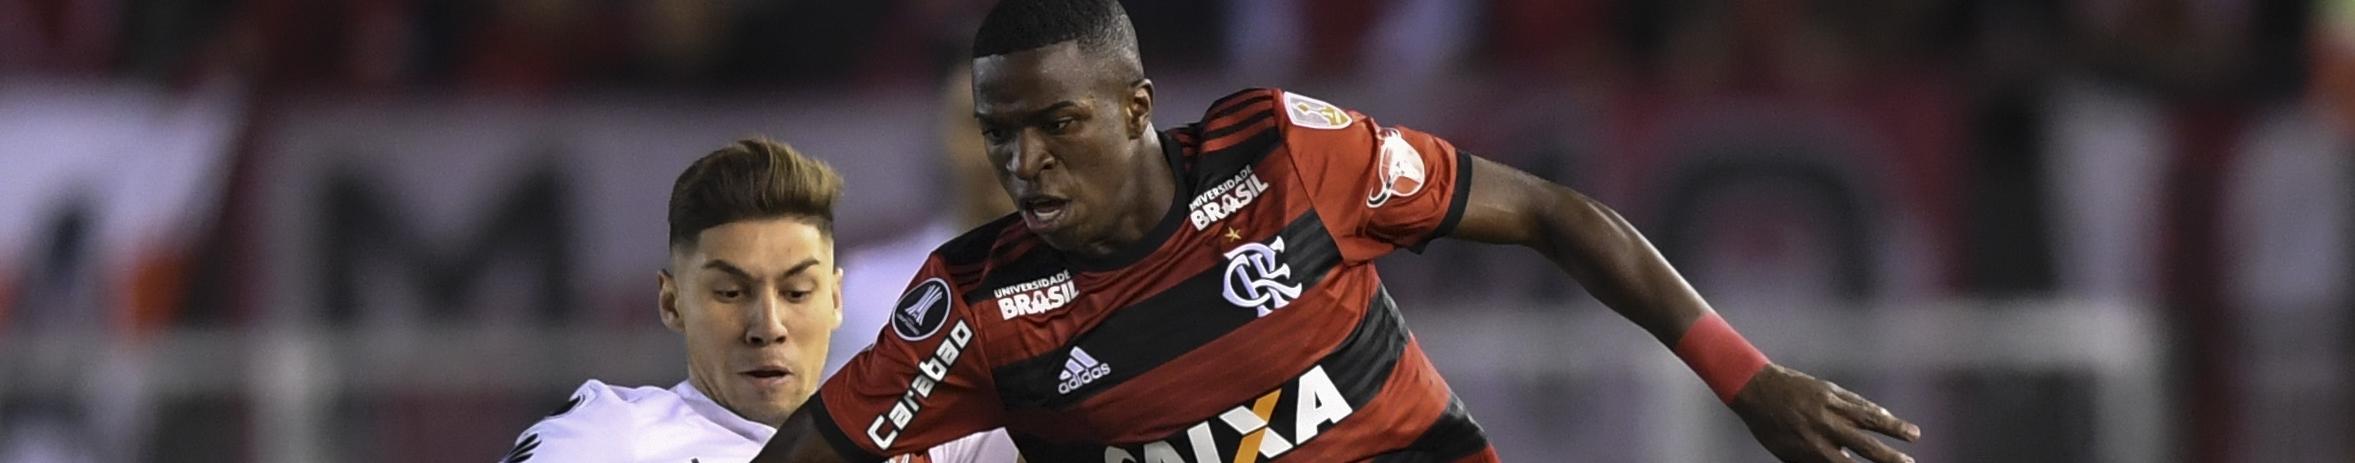 Copa Libertadores: Αυτή είναι η τεράστια ιστορία του! (Infographic)